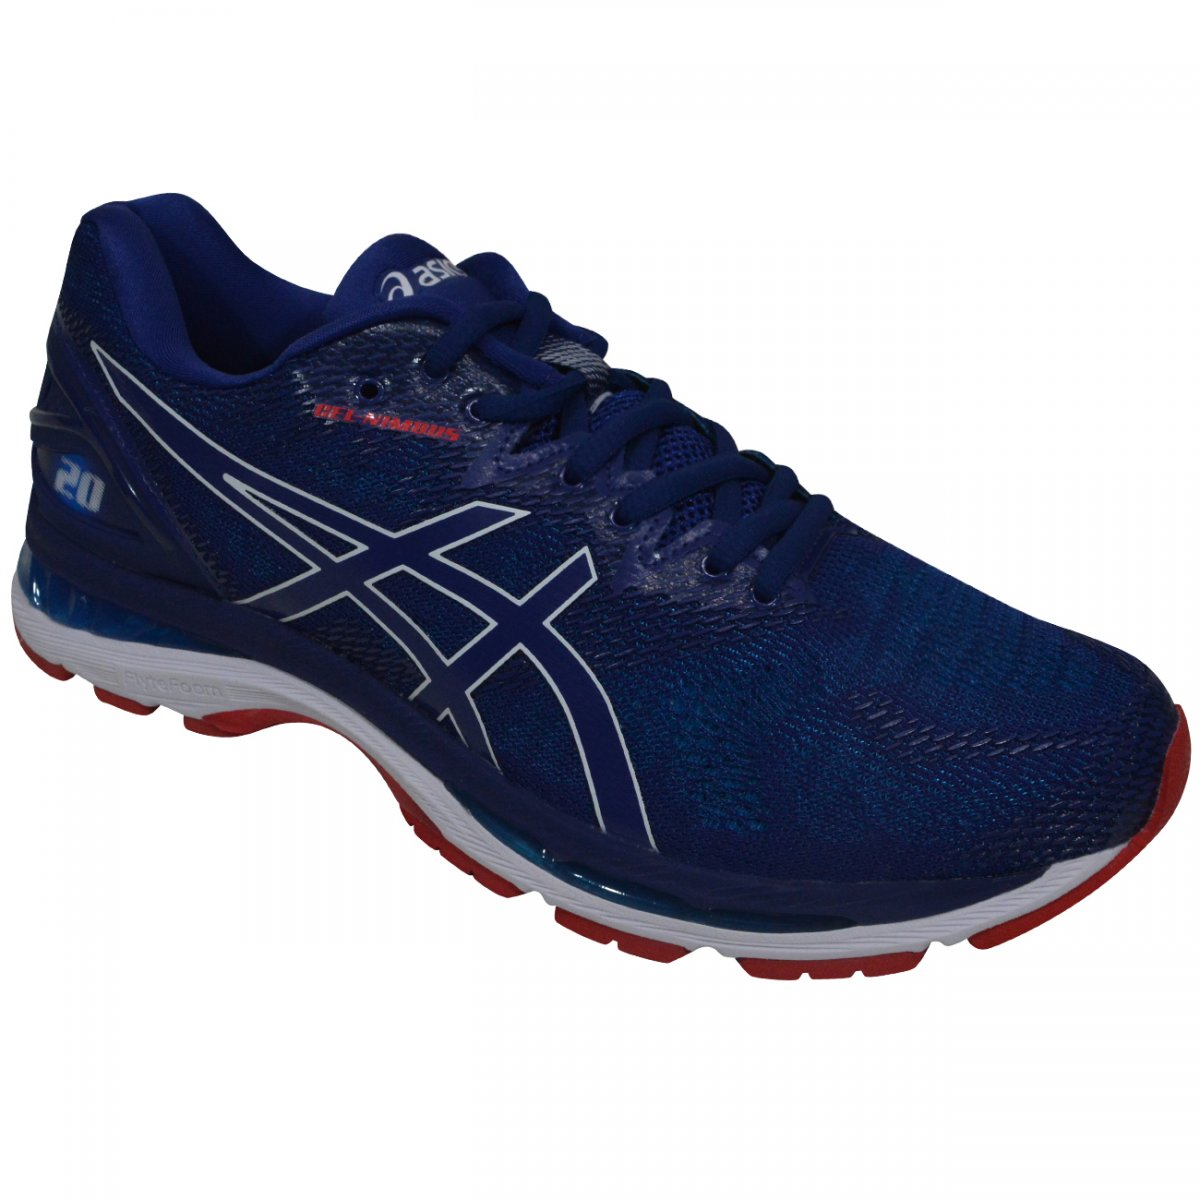 1eb2d87e92c Tenis Asics Gel-Nimbus 20 T800N-004 - Azul marinho branco - Chuteira Nike